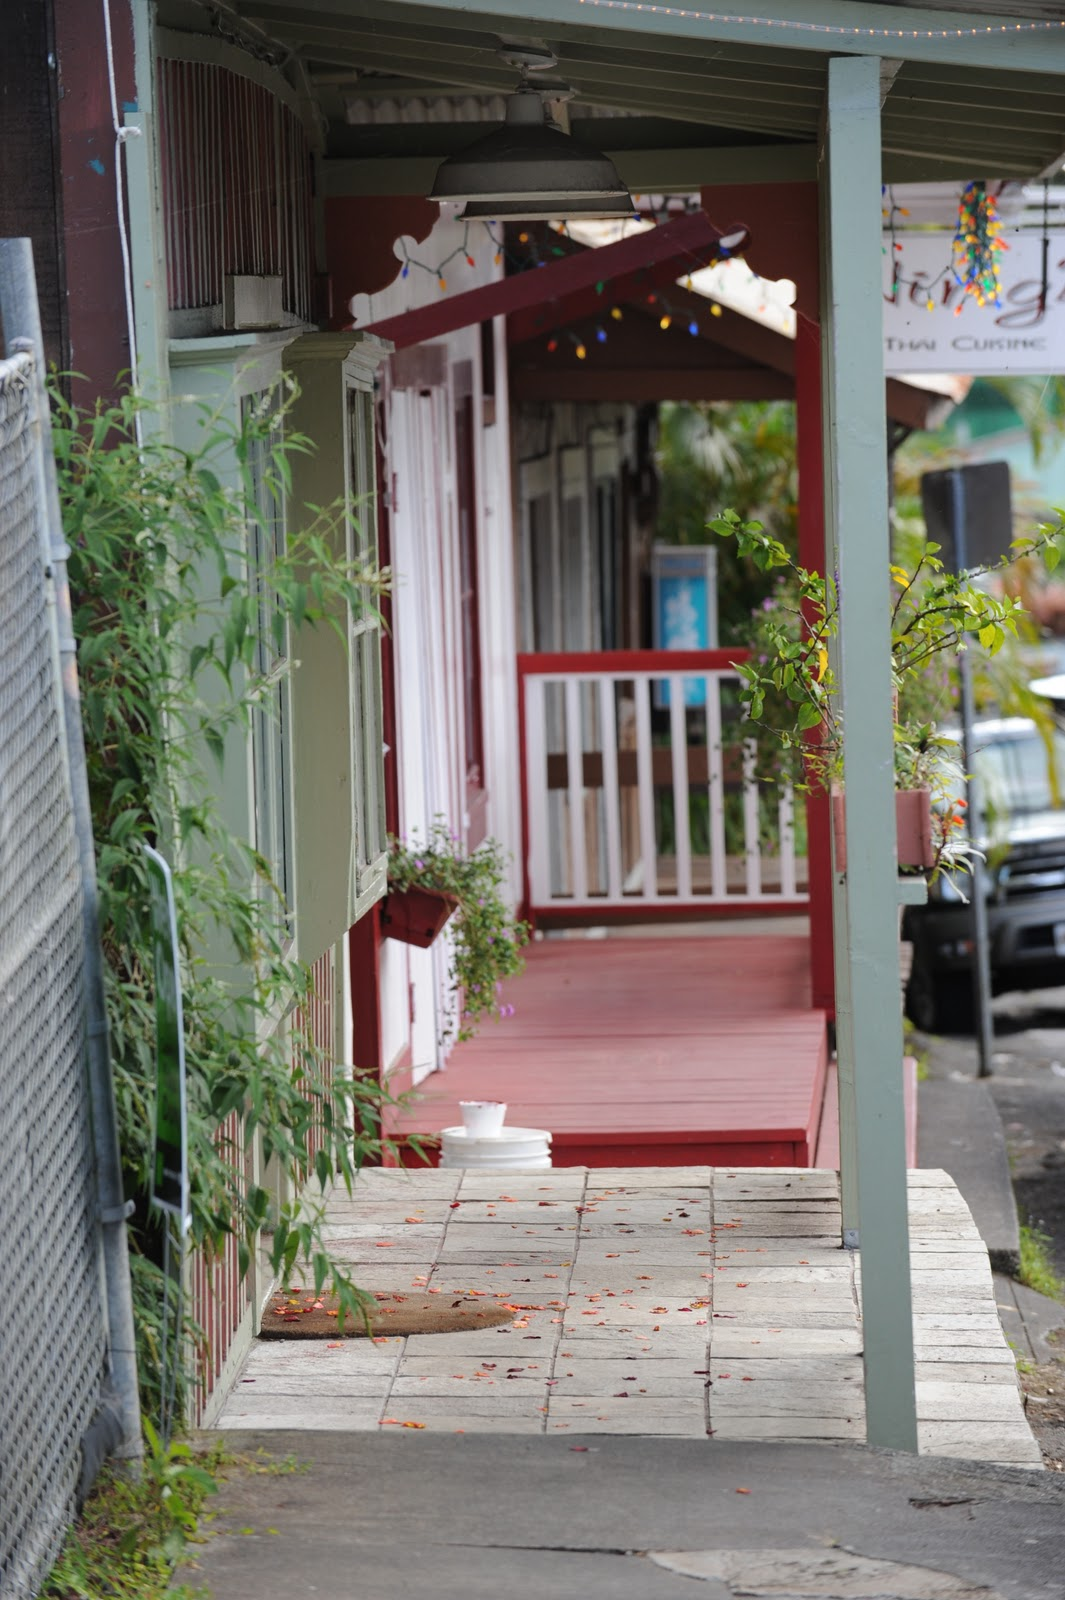 Closest Restaurants Open Right Now